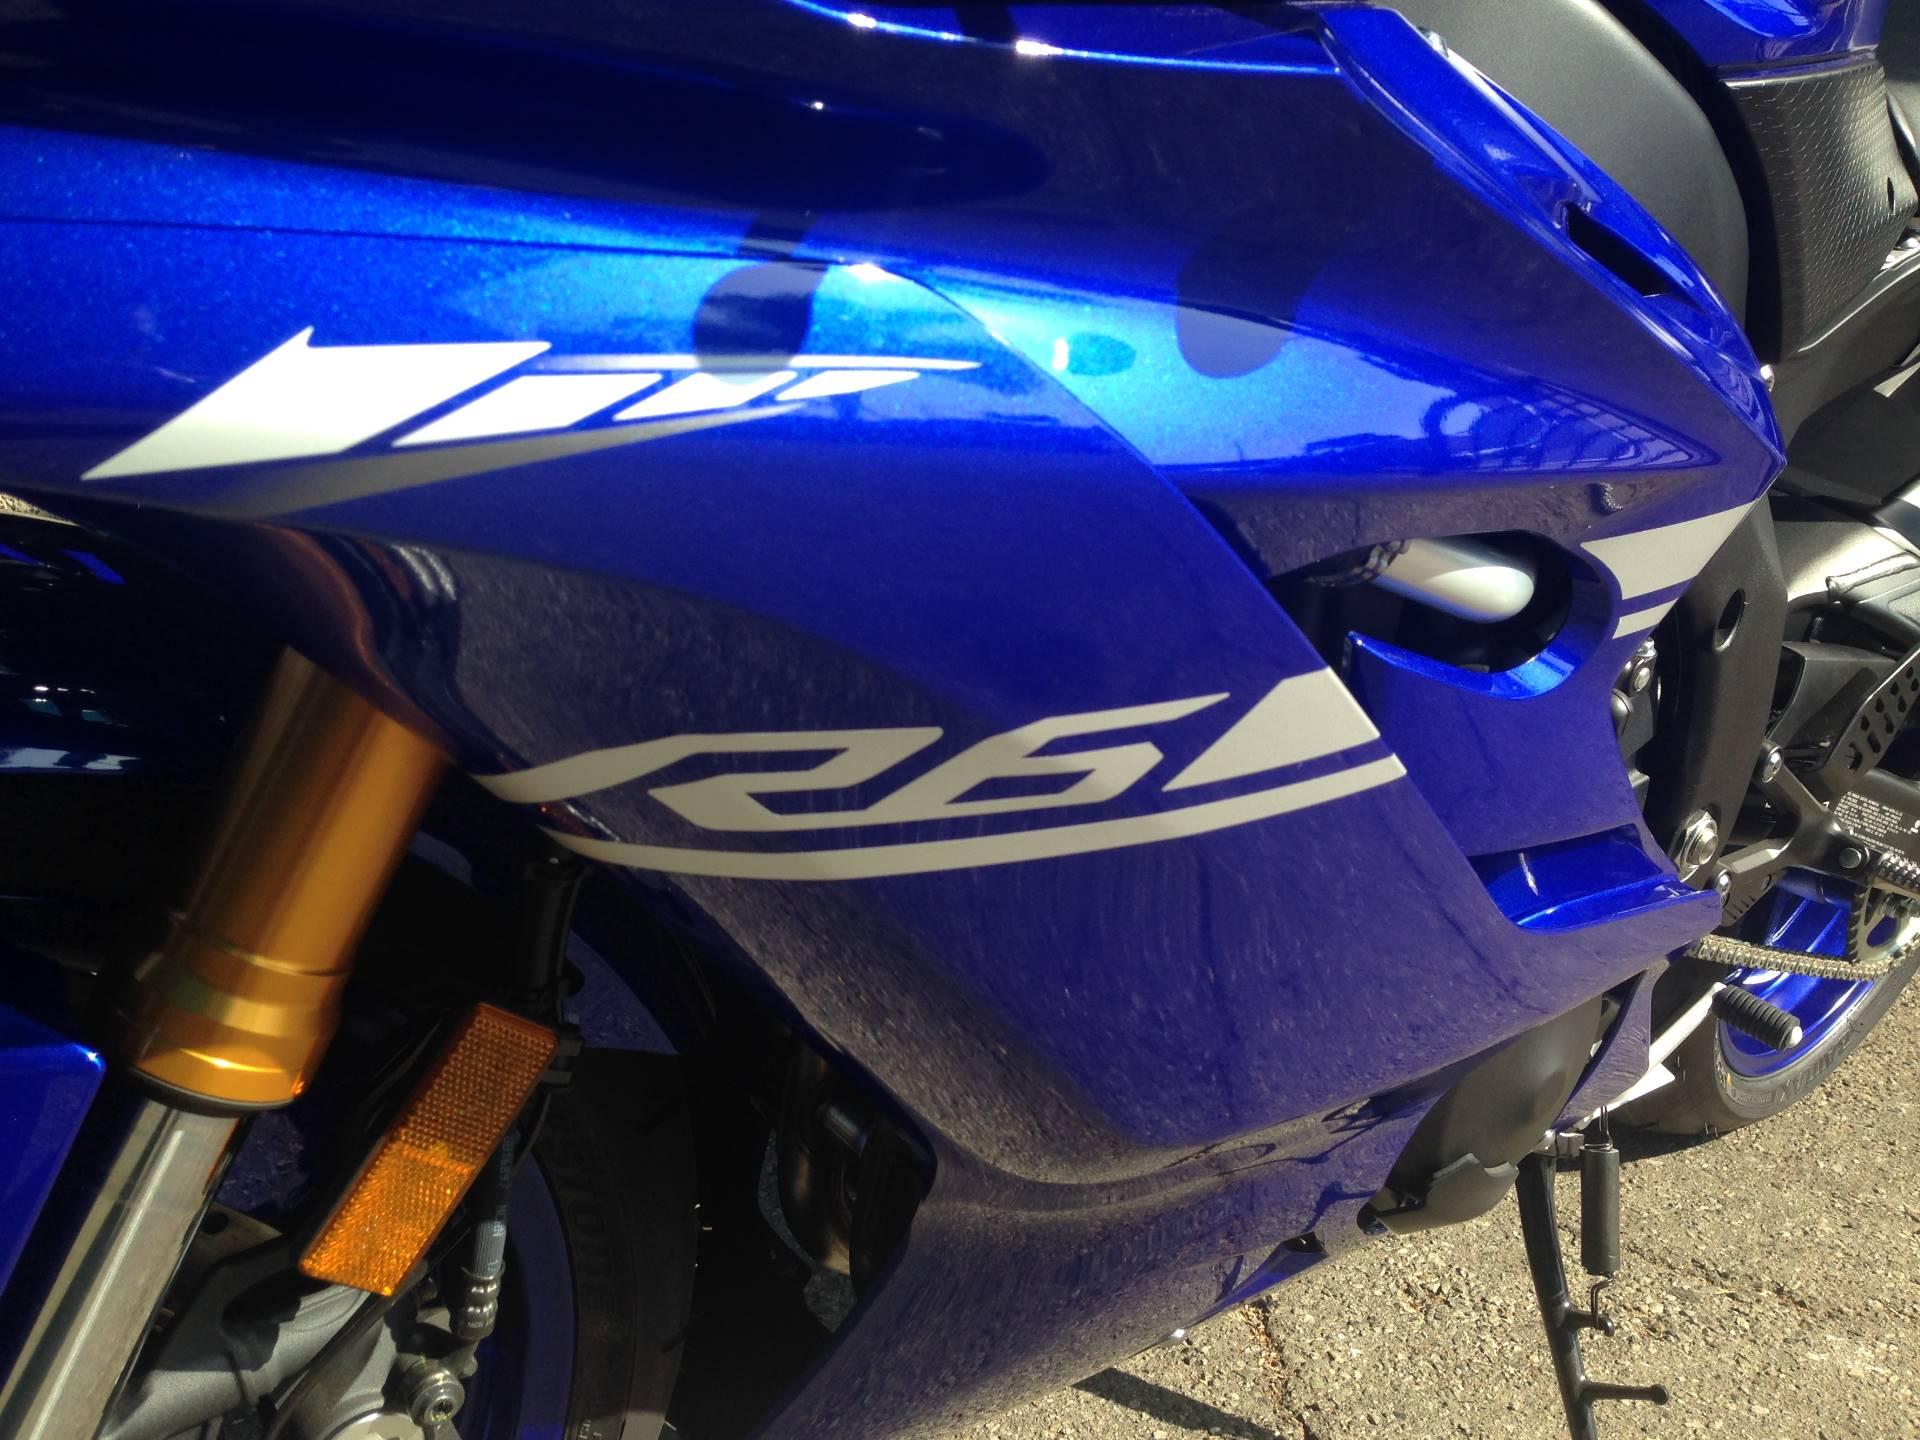 2017 Yamaha YZF-R6 for sale 9319